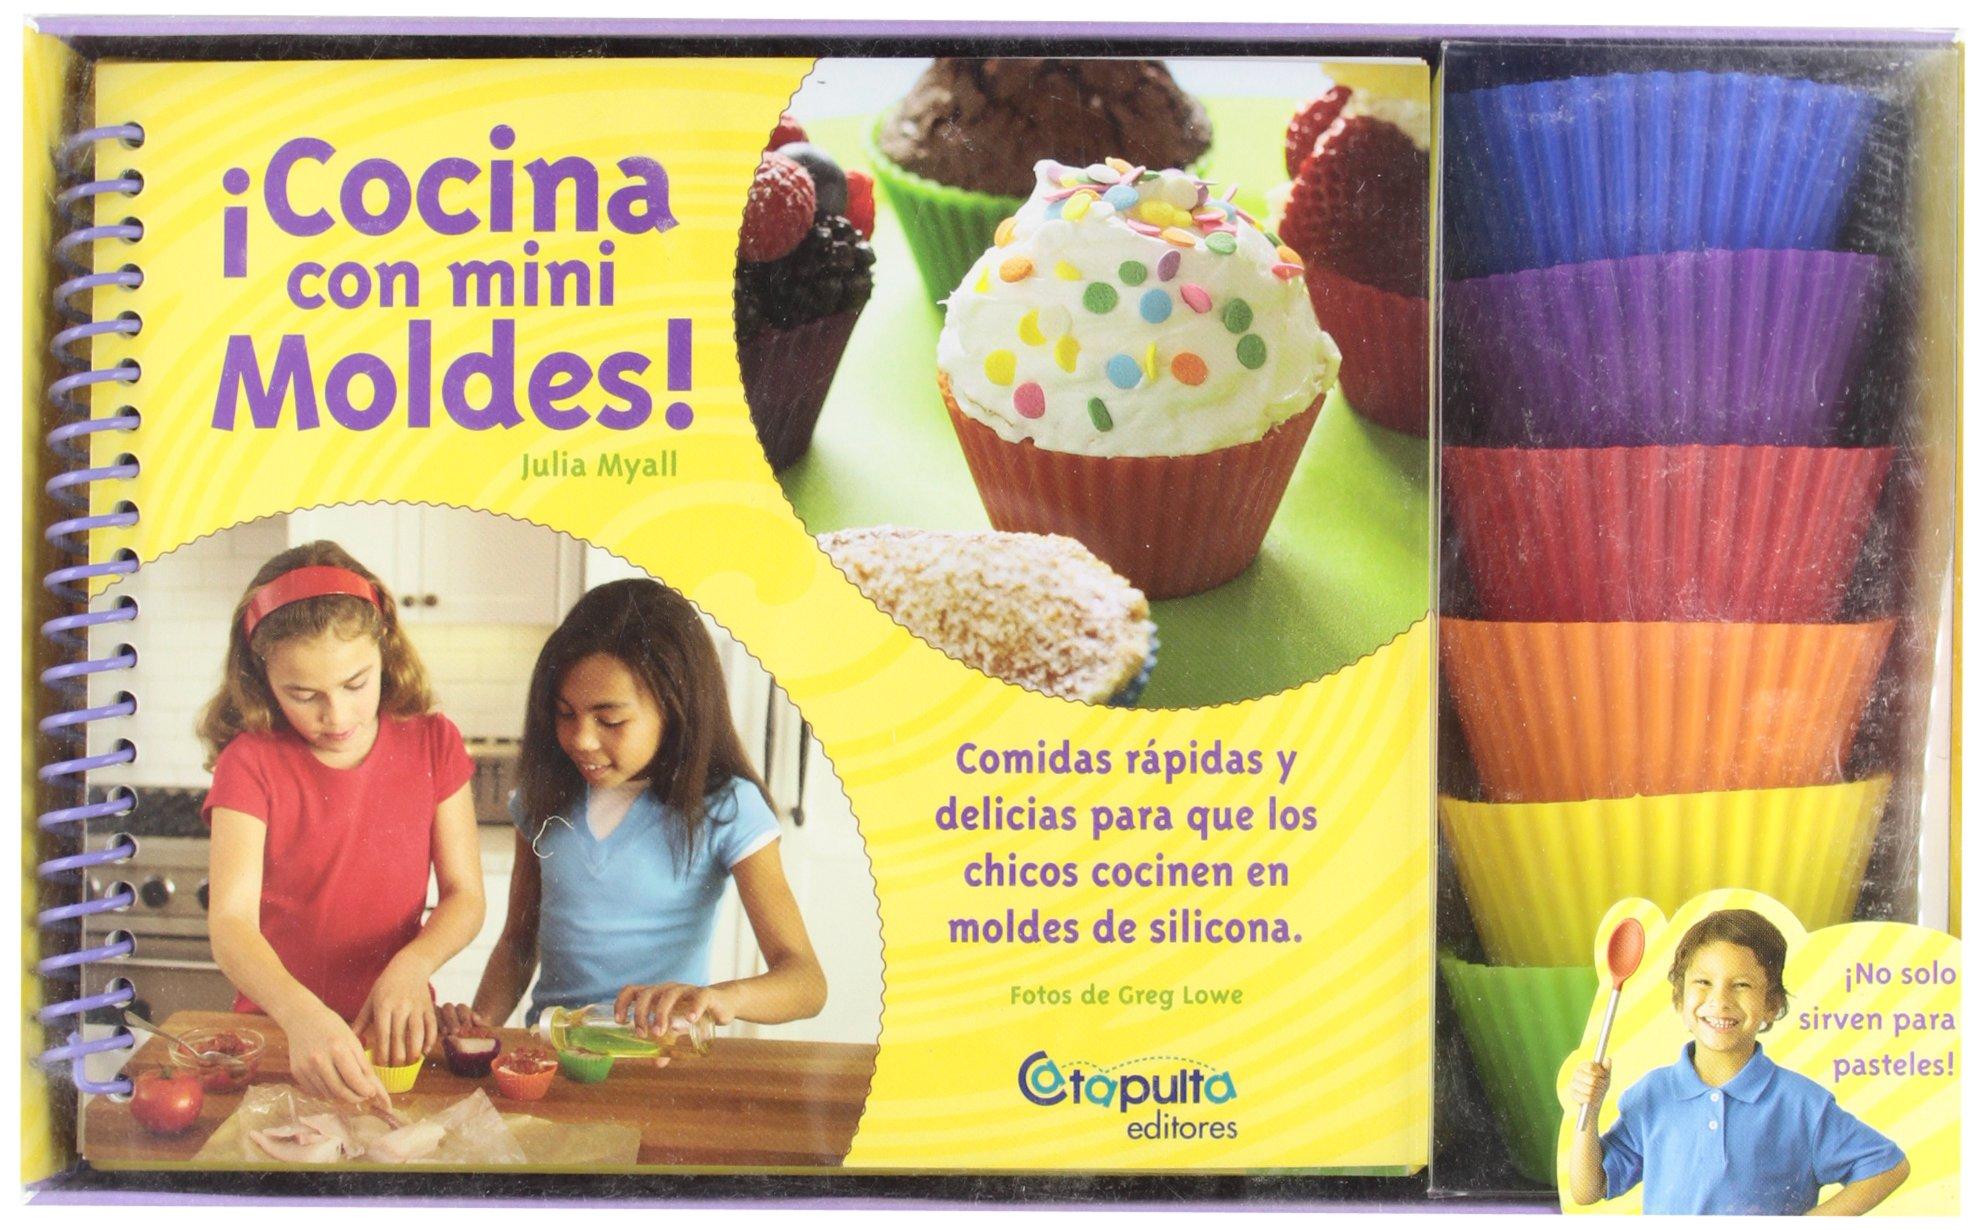 COCINA CON MINI MOLDES (Spanish Edition) (Spanish) Paperback – 2013